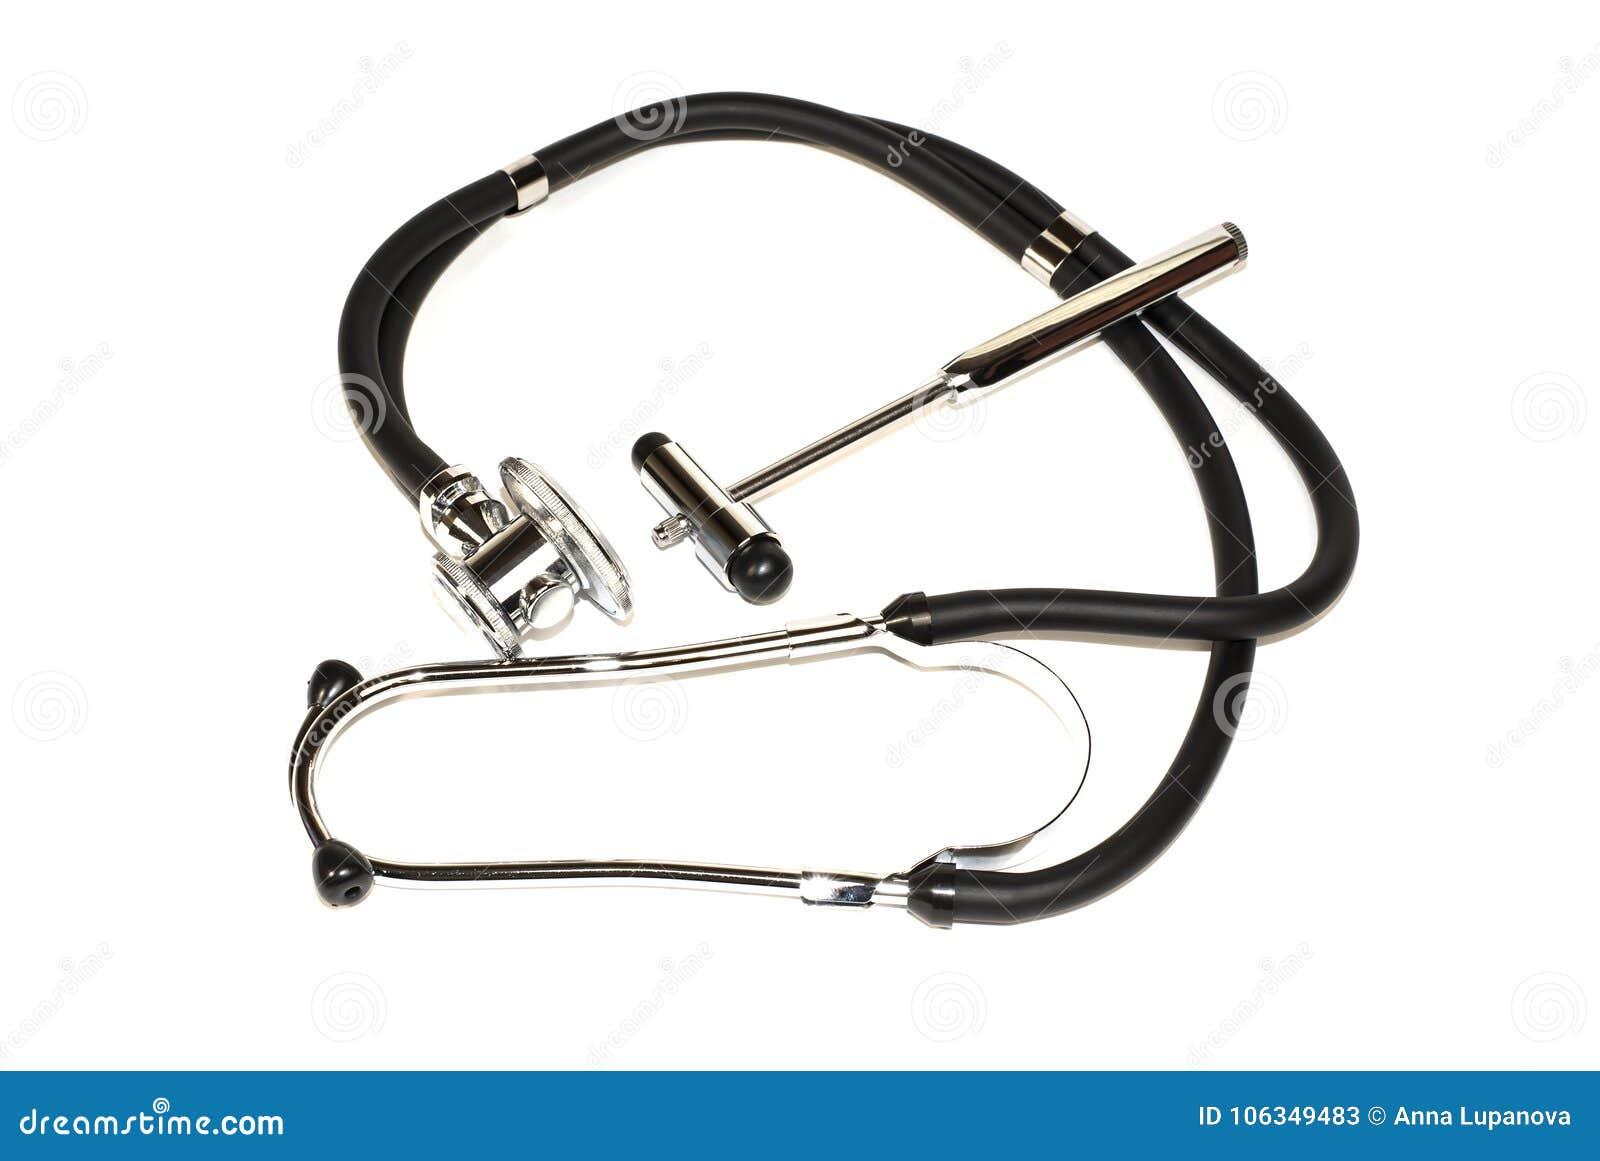 Stethoscope and neurological hammer